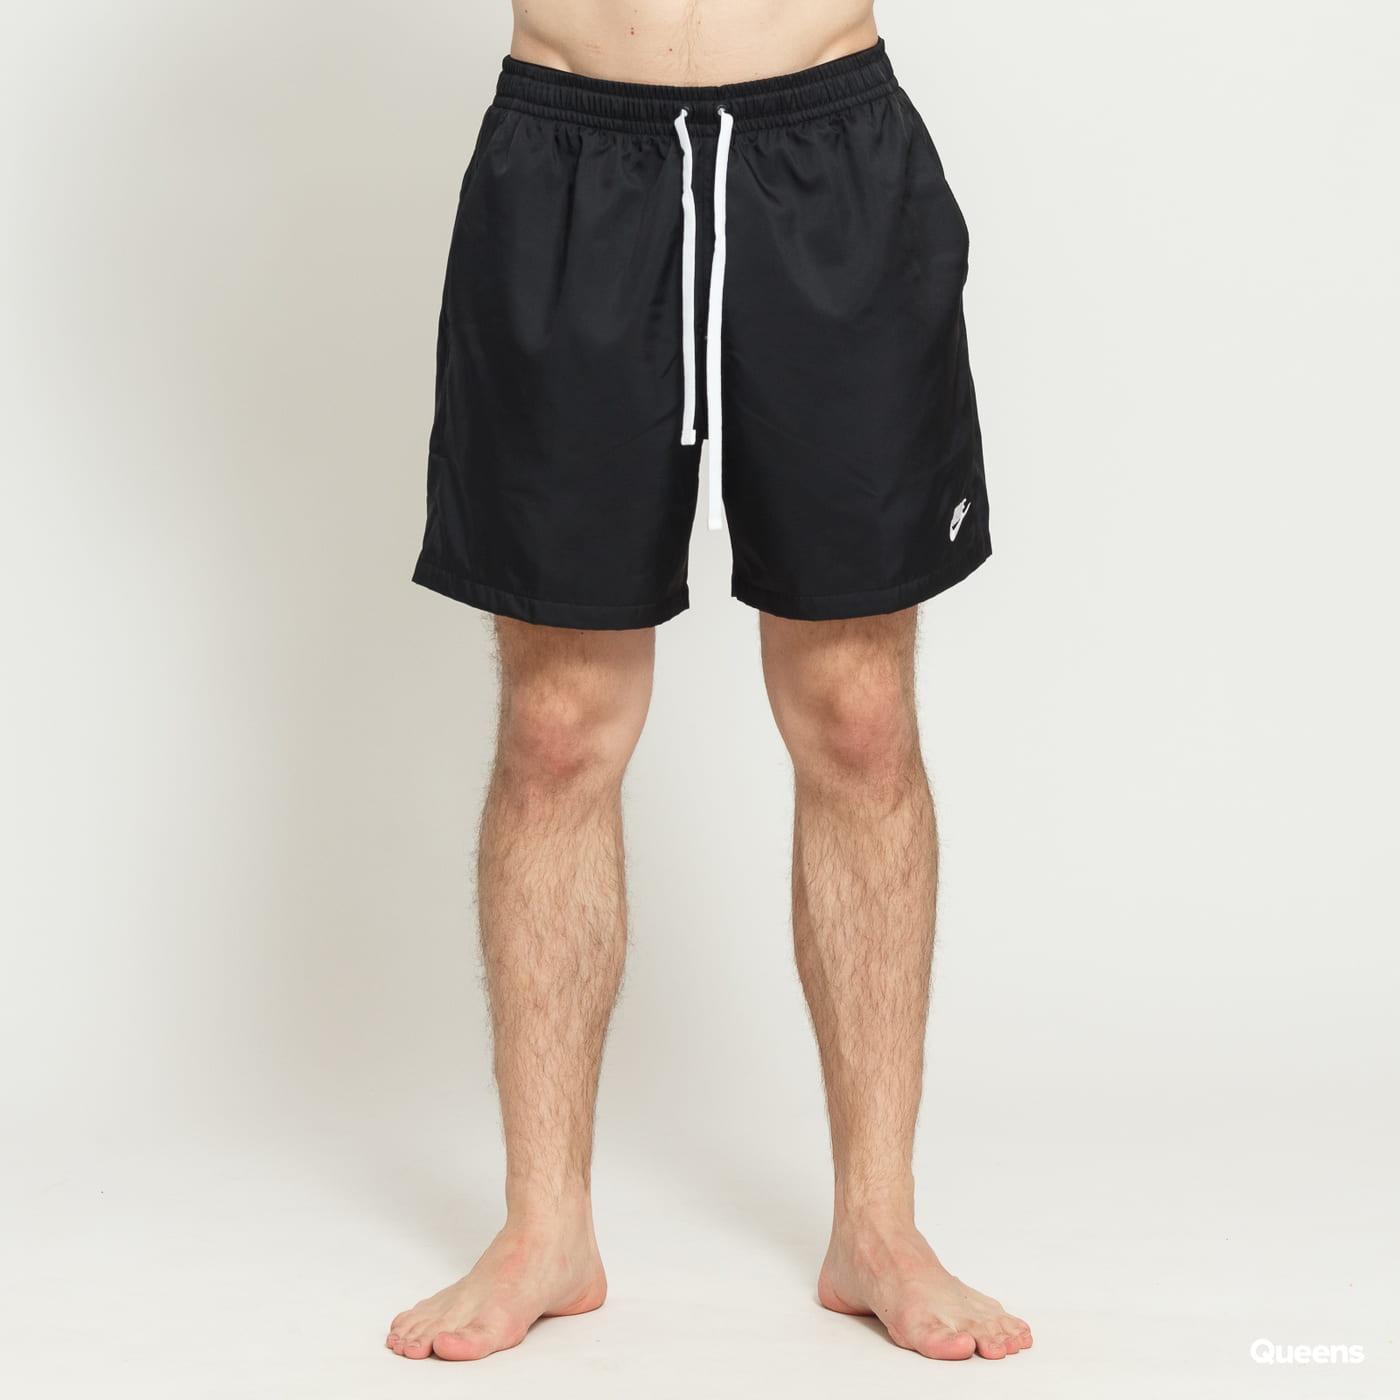 Nike M NSW CE Short Woven Flow black satin